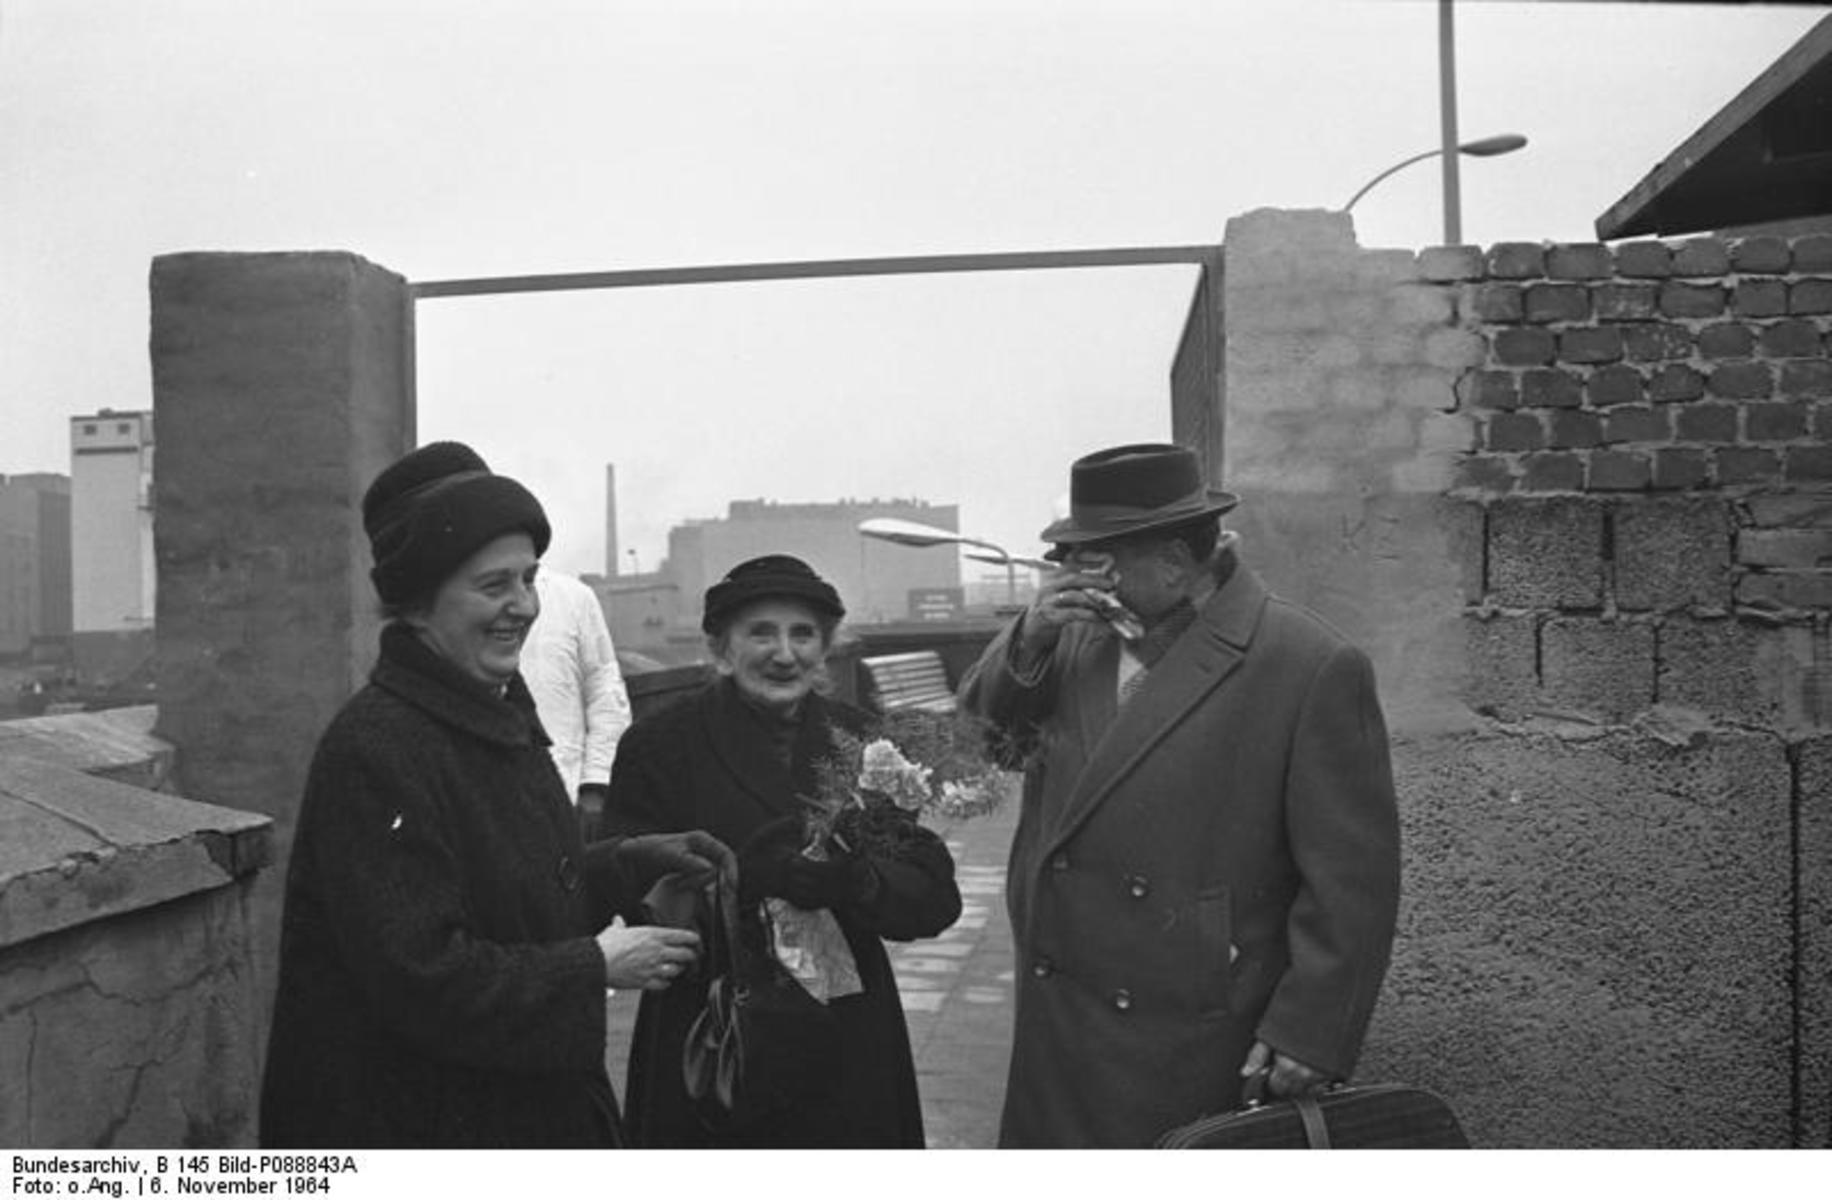 Bundesarchiv_B_145_Bild-P088843A,_Berlin,_Grenzübergang,_Besuch_aus_Ost-Berlin.jpg